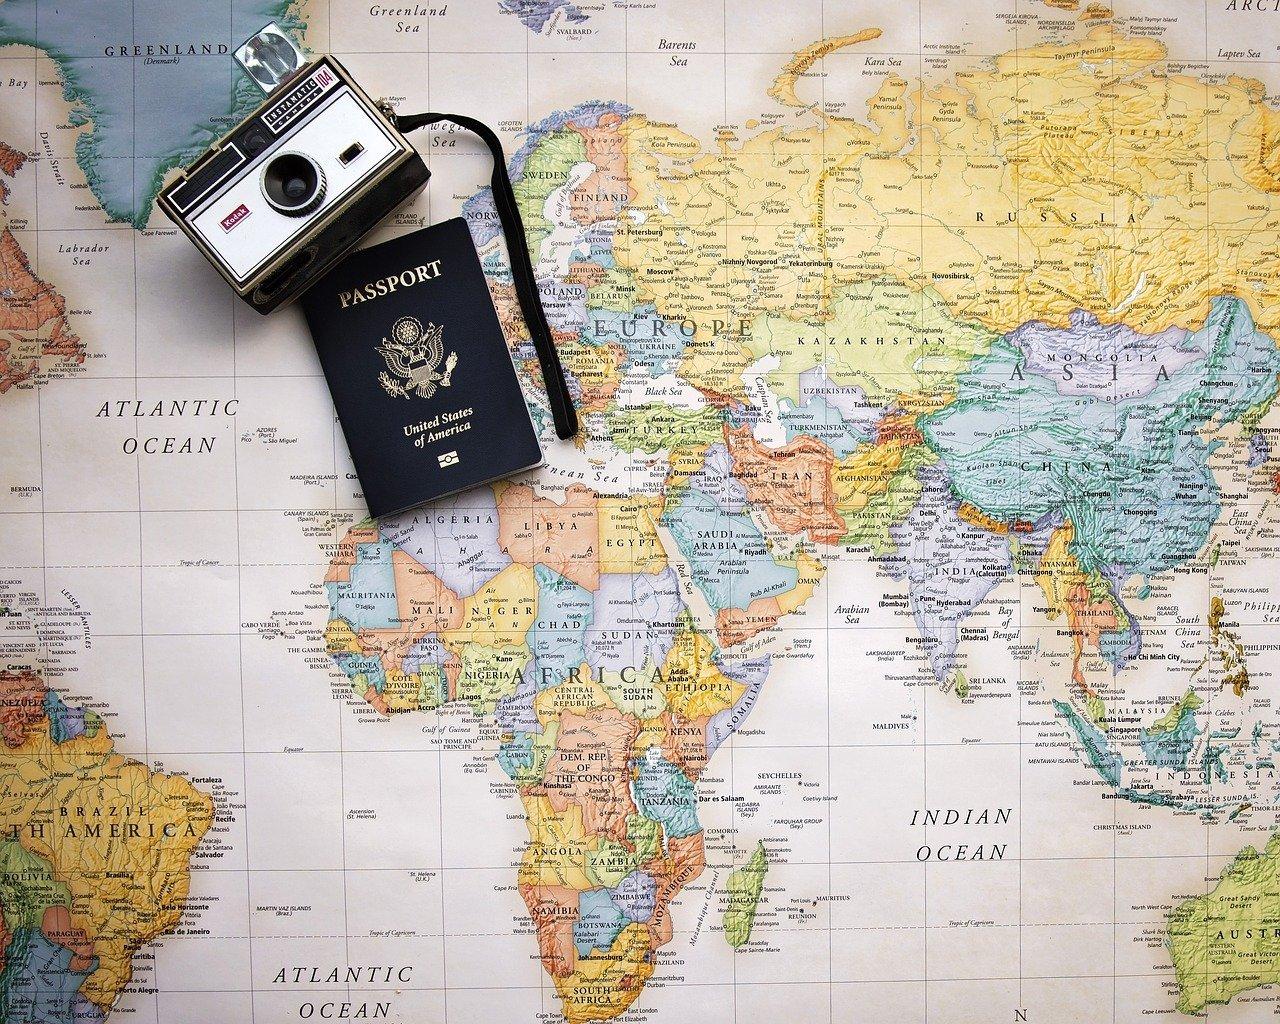 european tour companies comparison